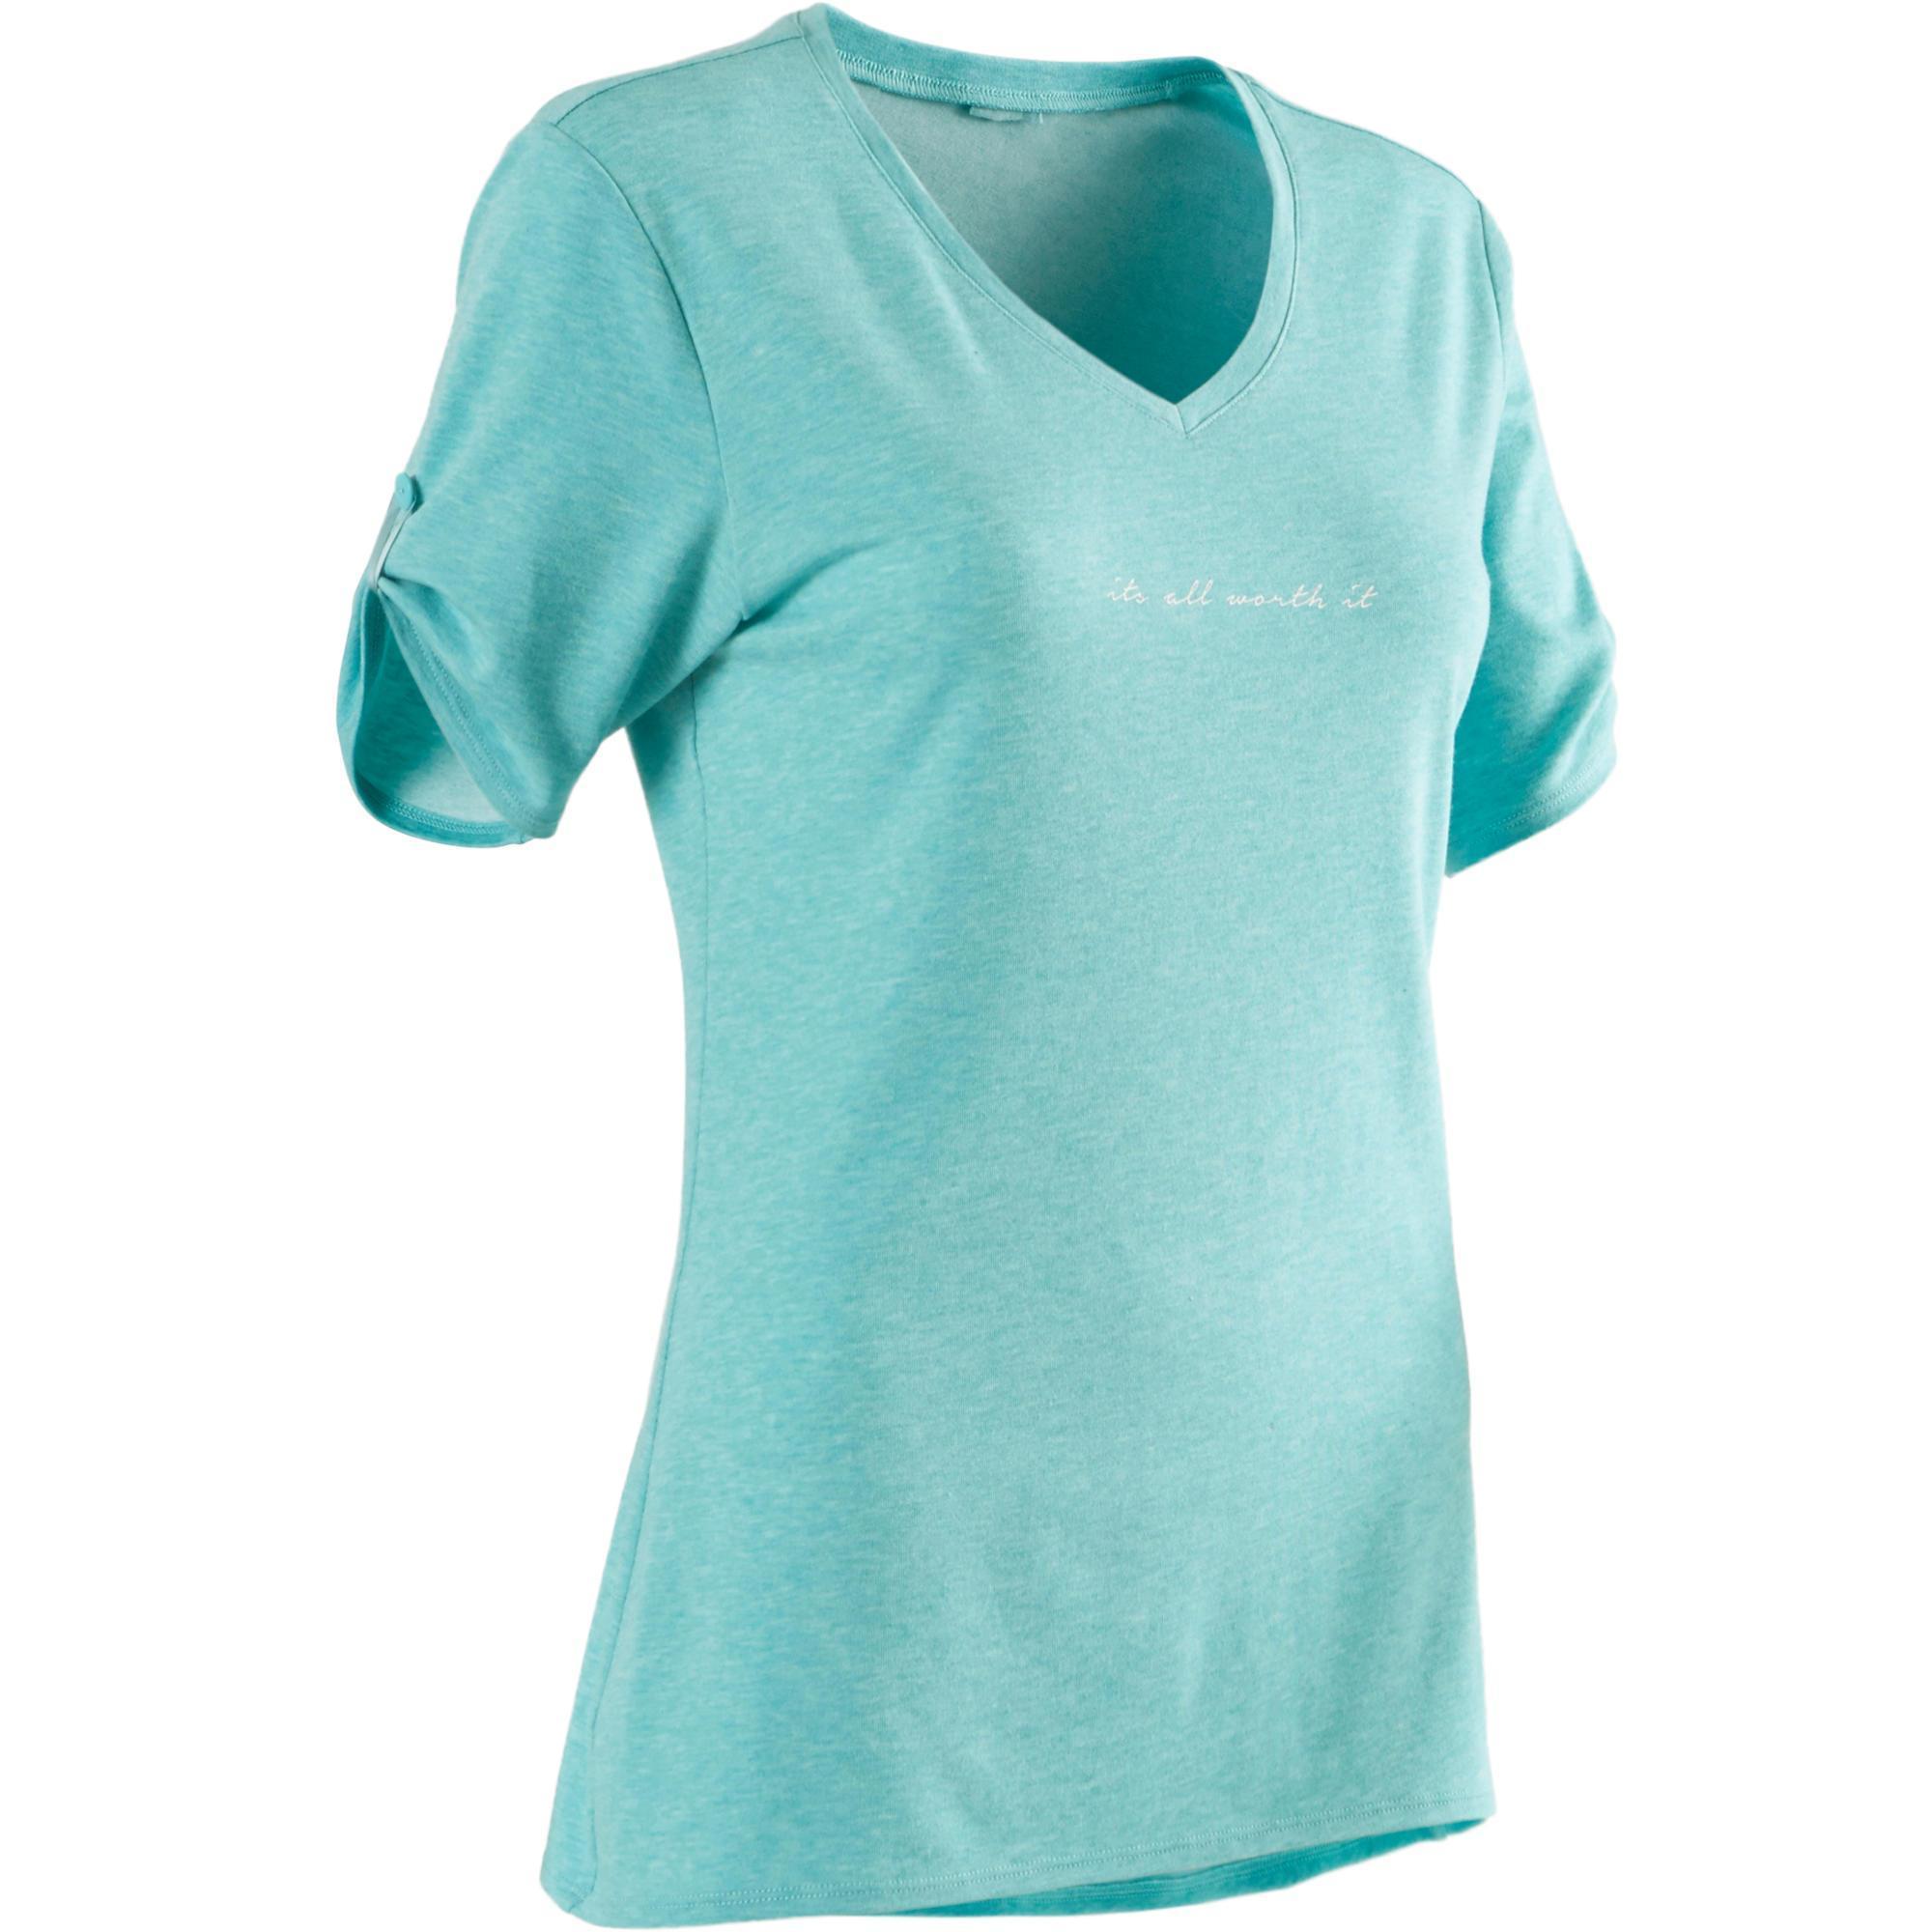 Domyos T-shirt 510 pilates en lichte gym dames blauw print